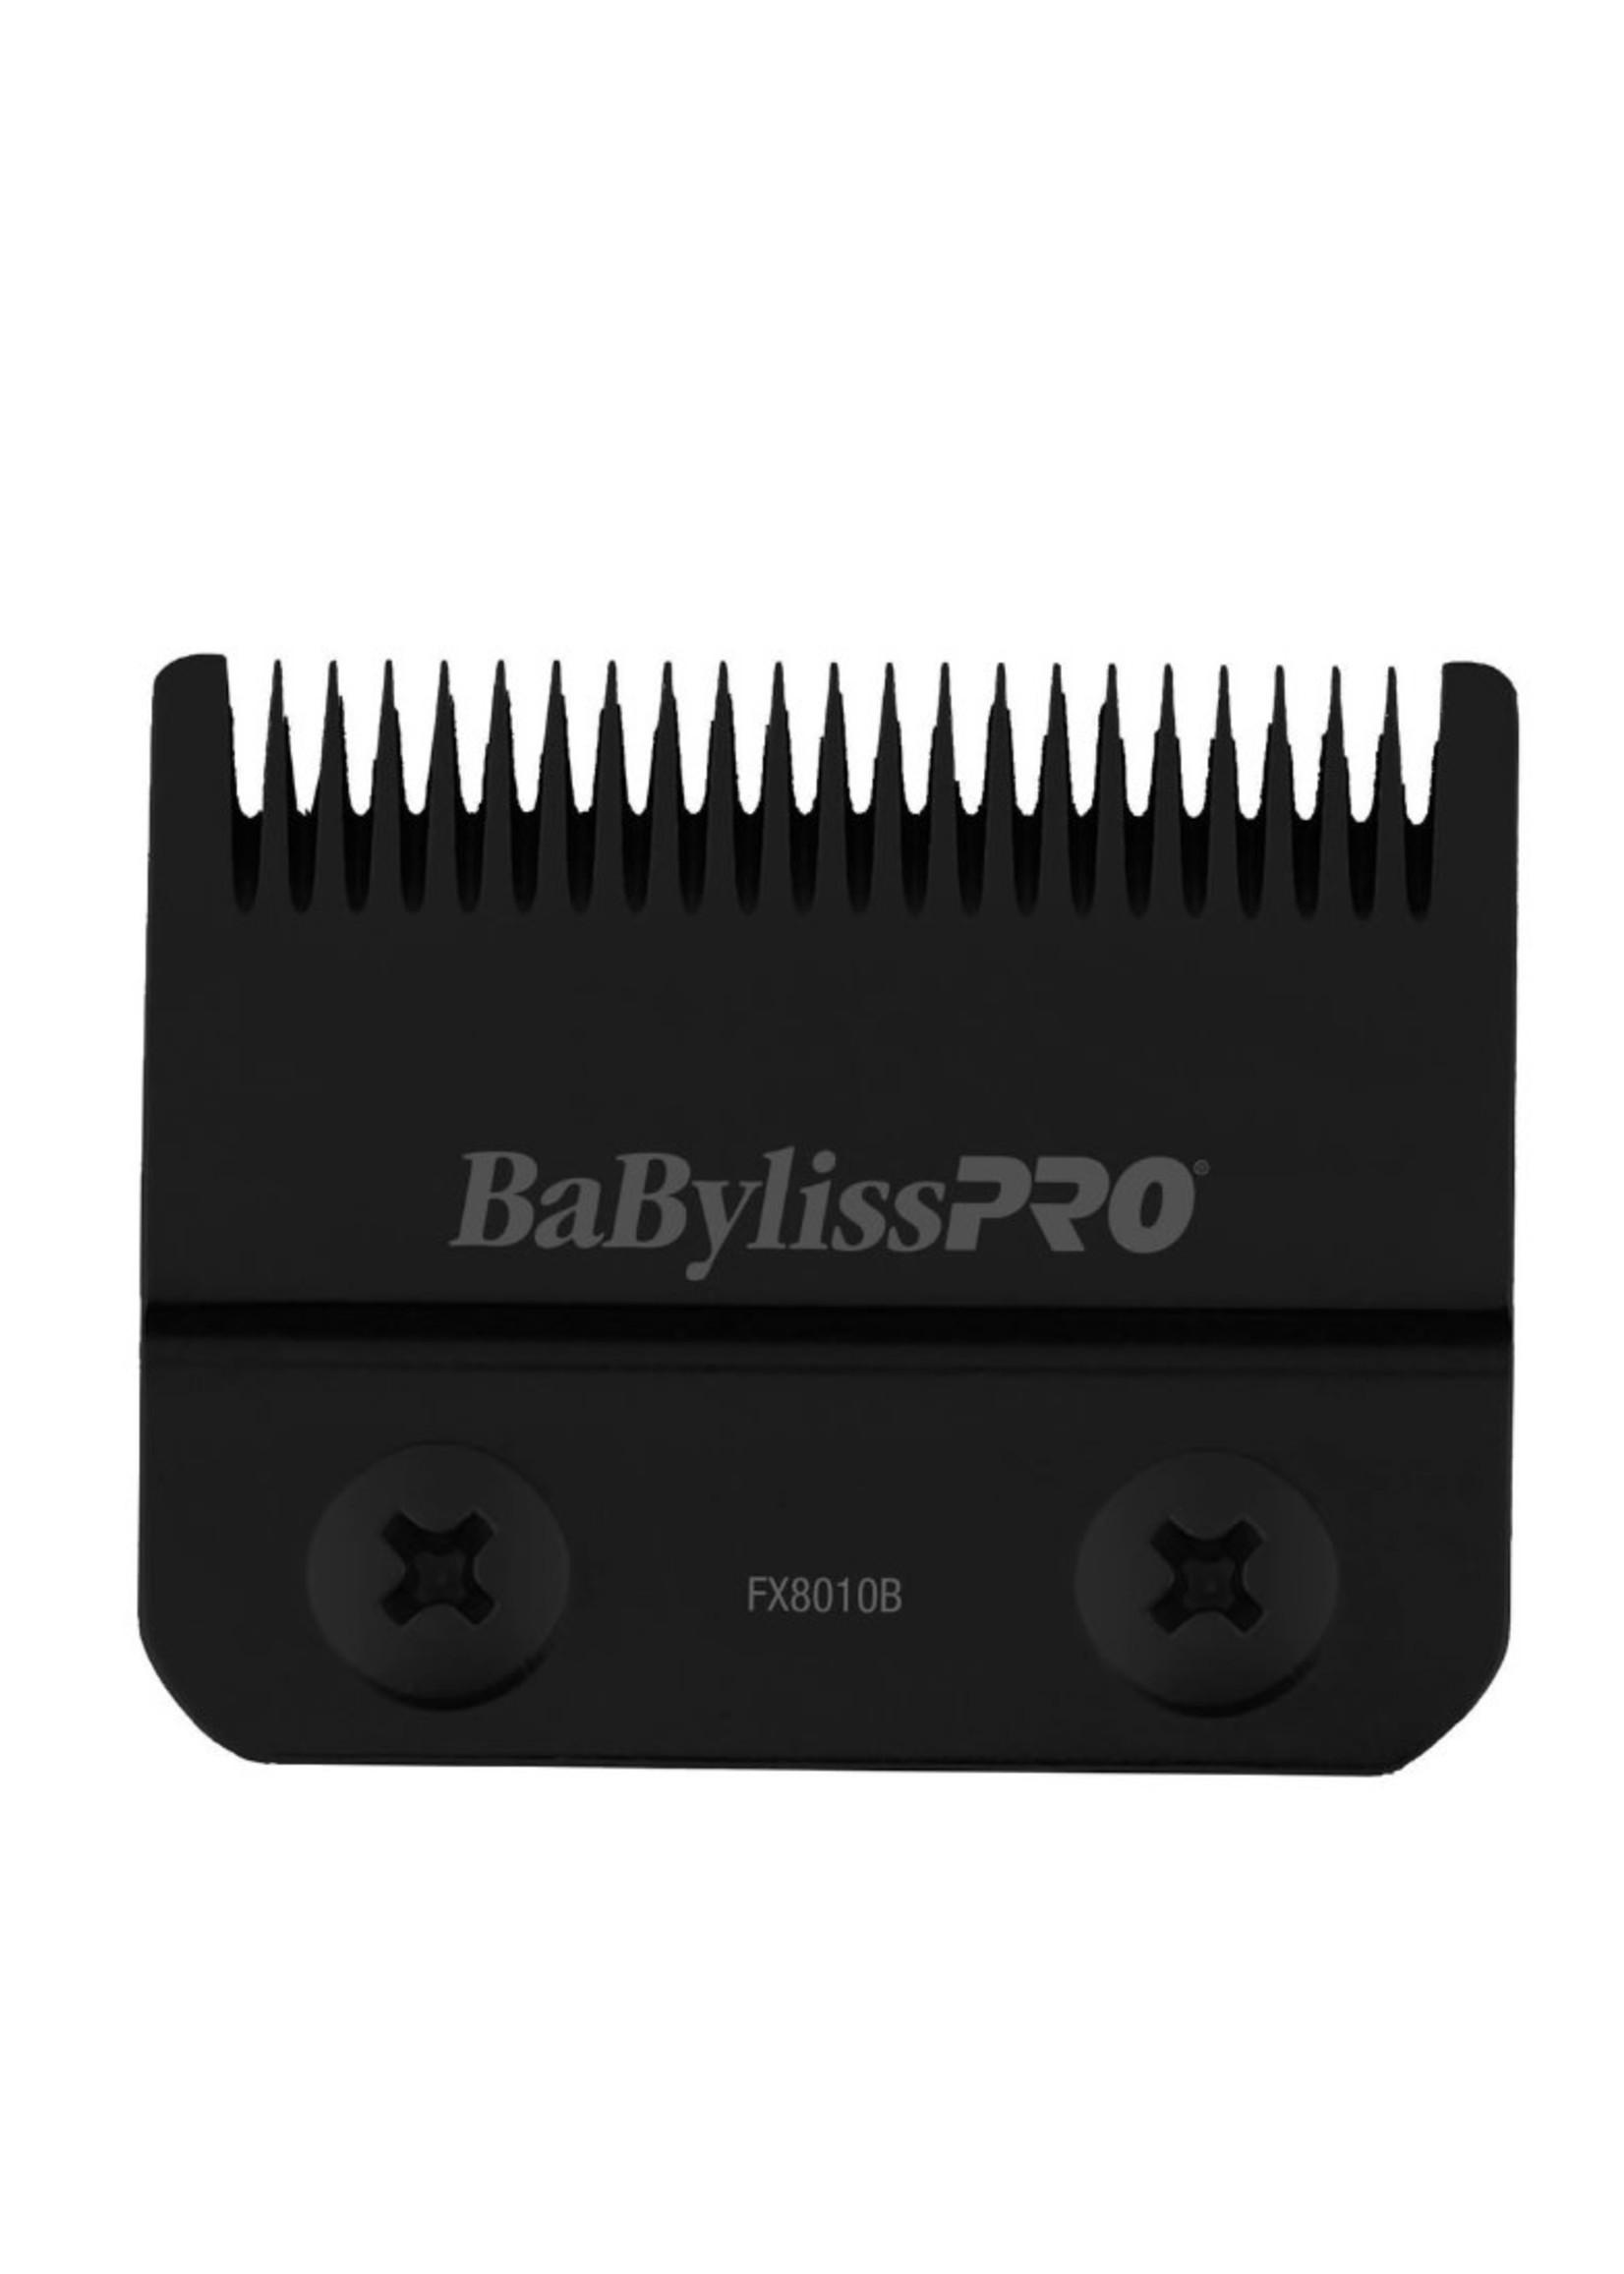 BabylissPro BabylissPro  Graphite Fade Blade- FX8010B